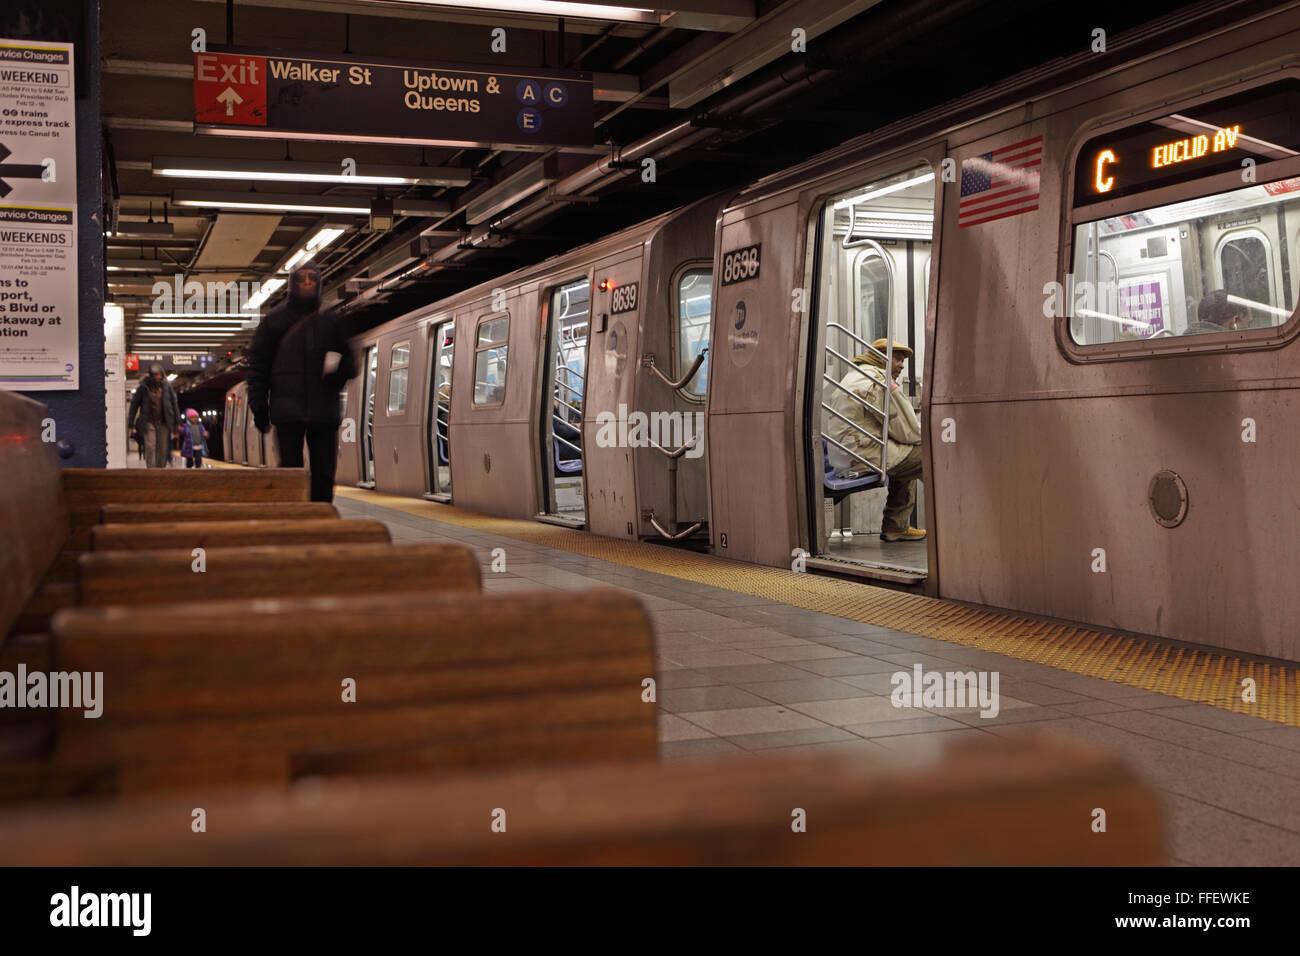 New York City C u-Bahn zieht in Canal Street Station. Stockbild